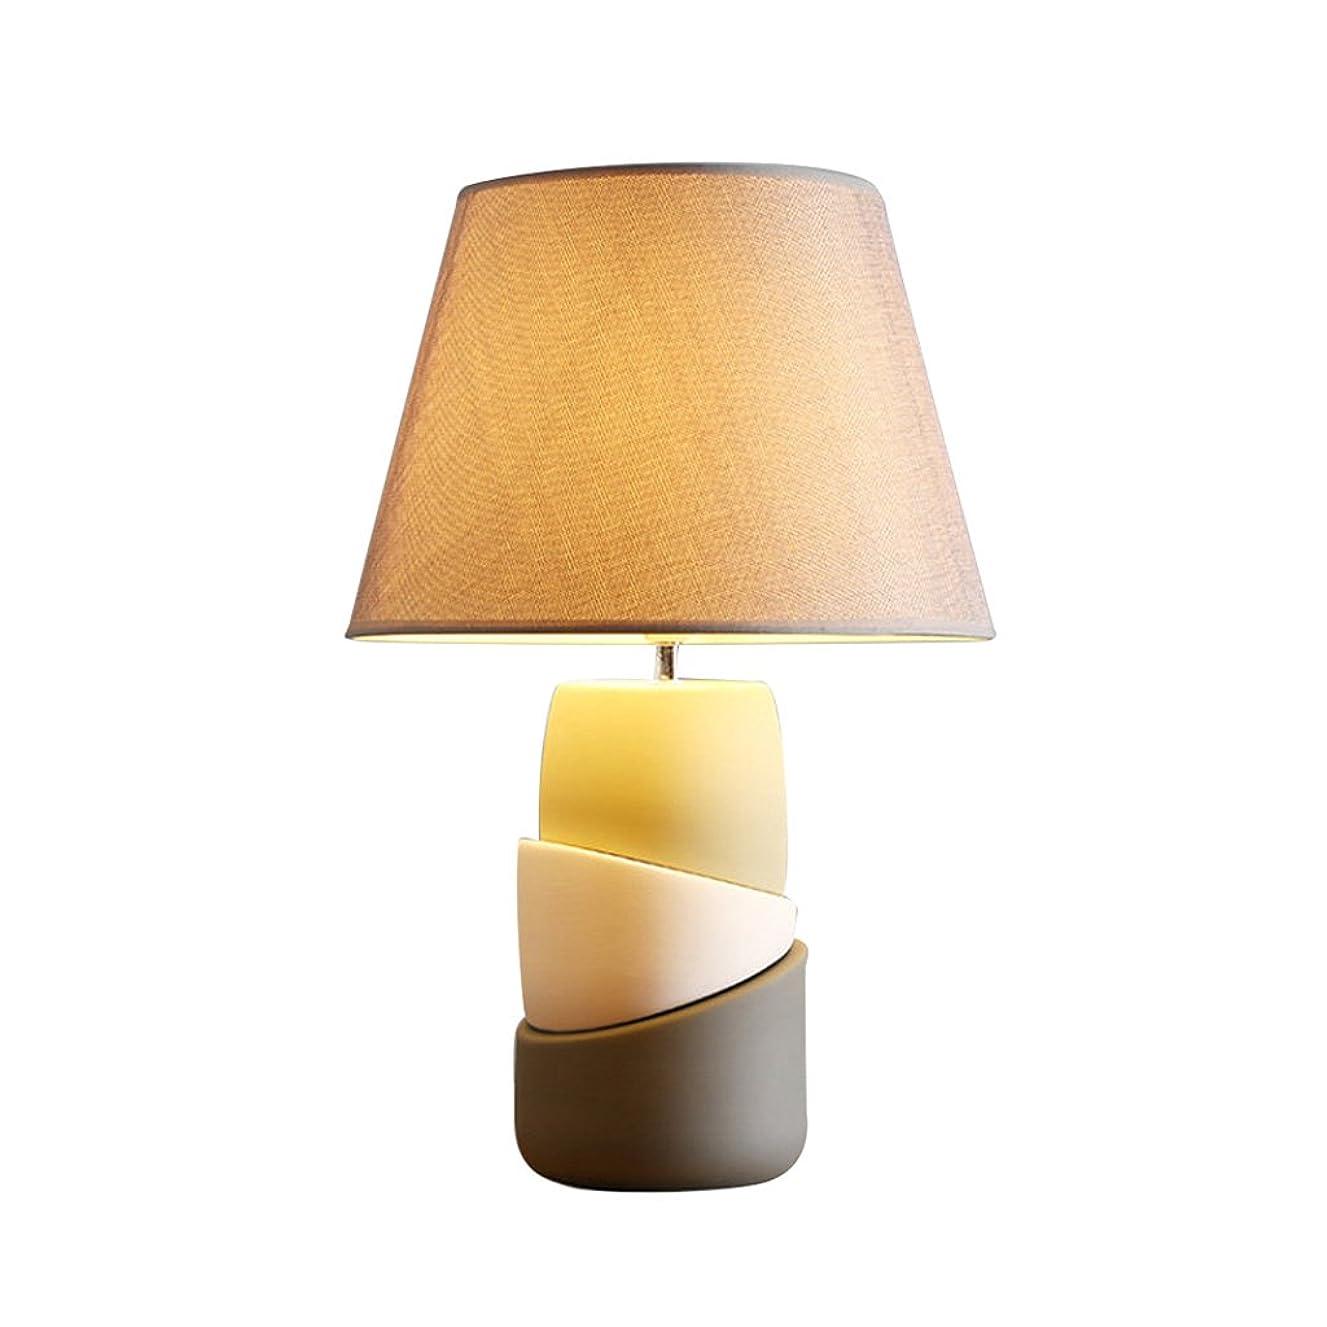 Ceramic lamp bedroom lamp fabric lamp cover creative bedside lamp personality eye Tabletop Lighting